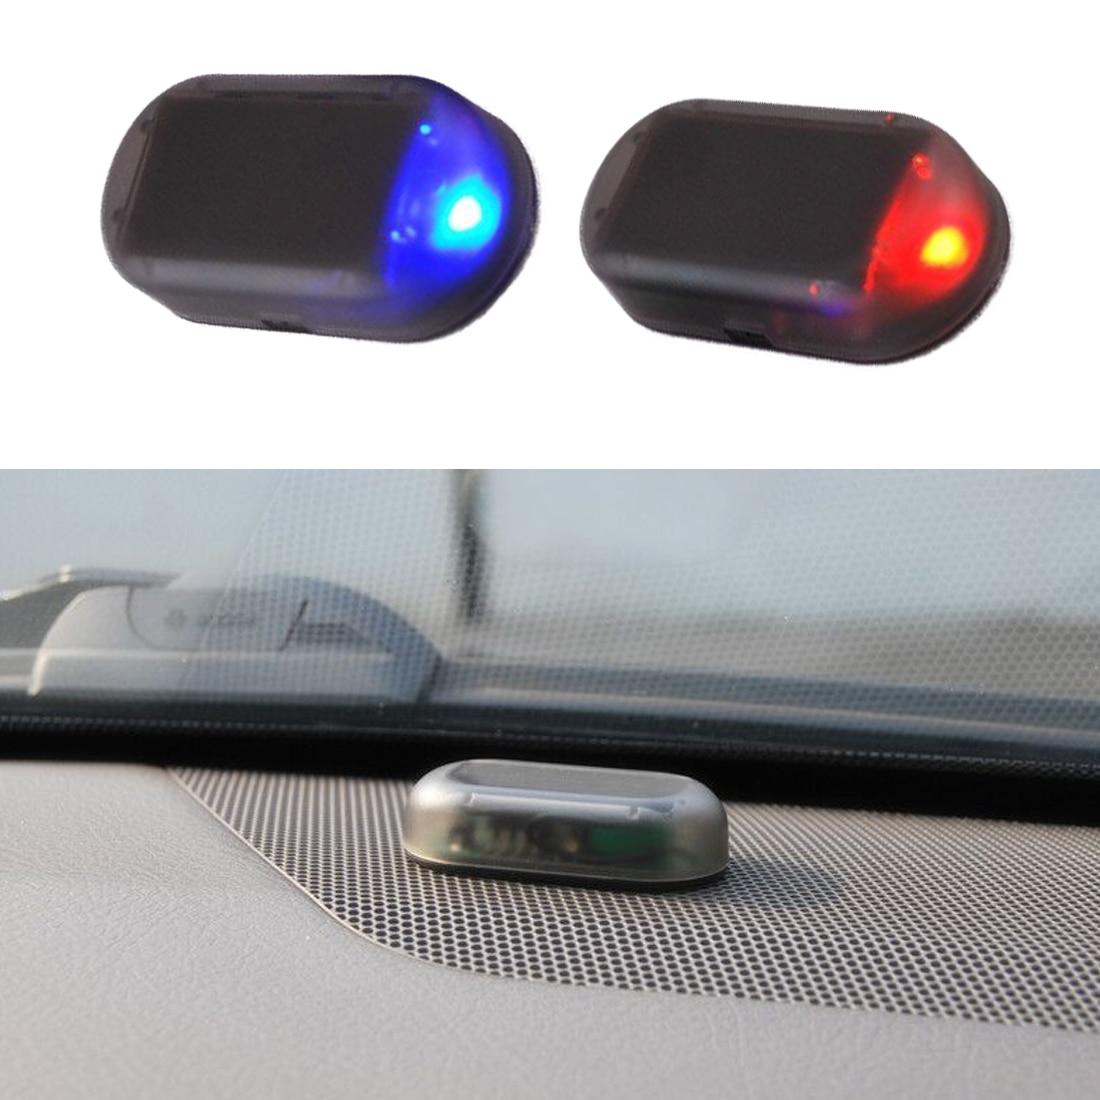 Car Protection Supplies Simulation Led Alarm Light Security Fake Solar System Warning Theft Flash Blinking Car